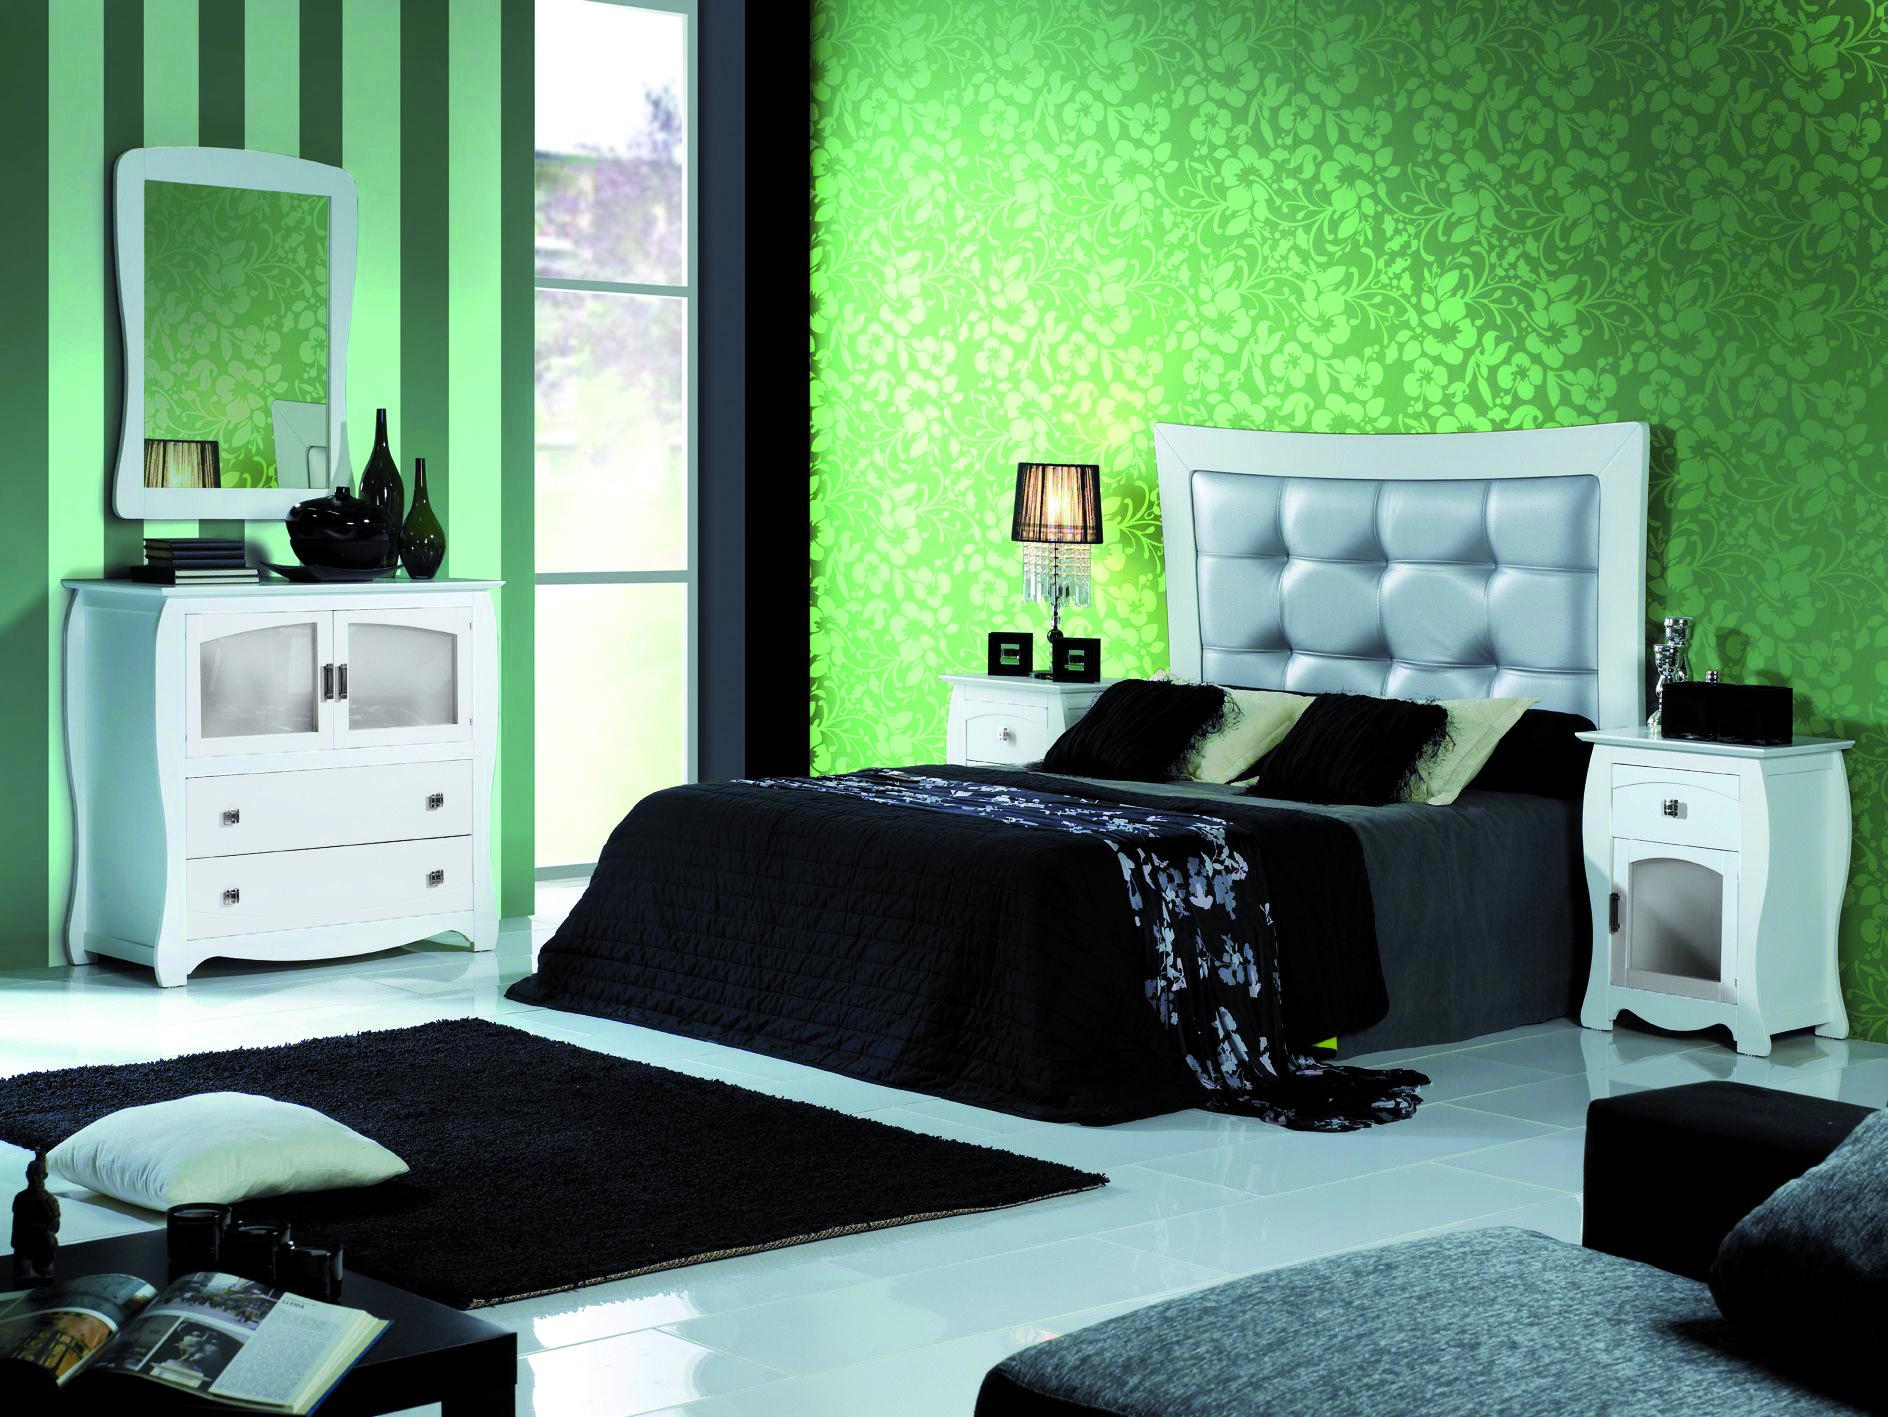 Mil anuncioscom lucena muebles lucena venta de muebles de for Muebles en lucena